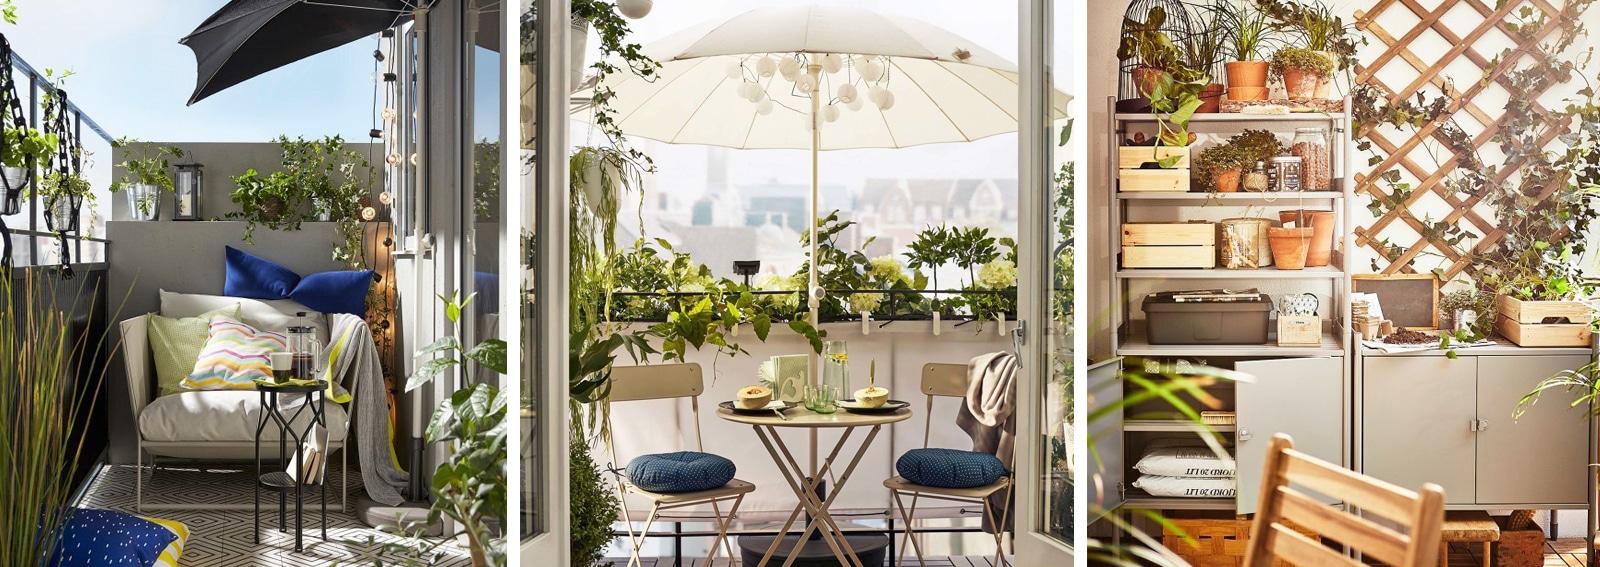 cover-idee-arredare-balcone-ikea-dektop